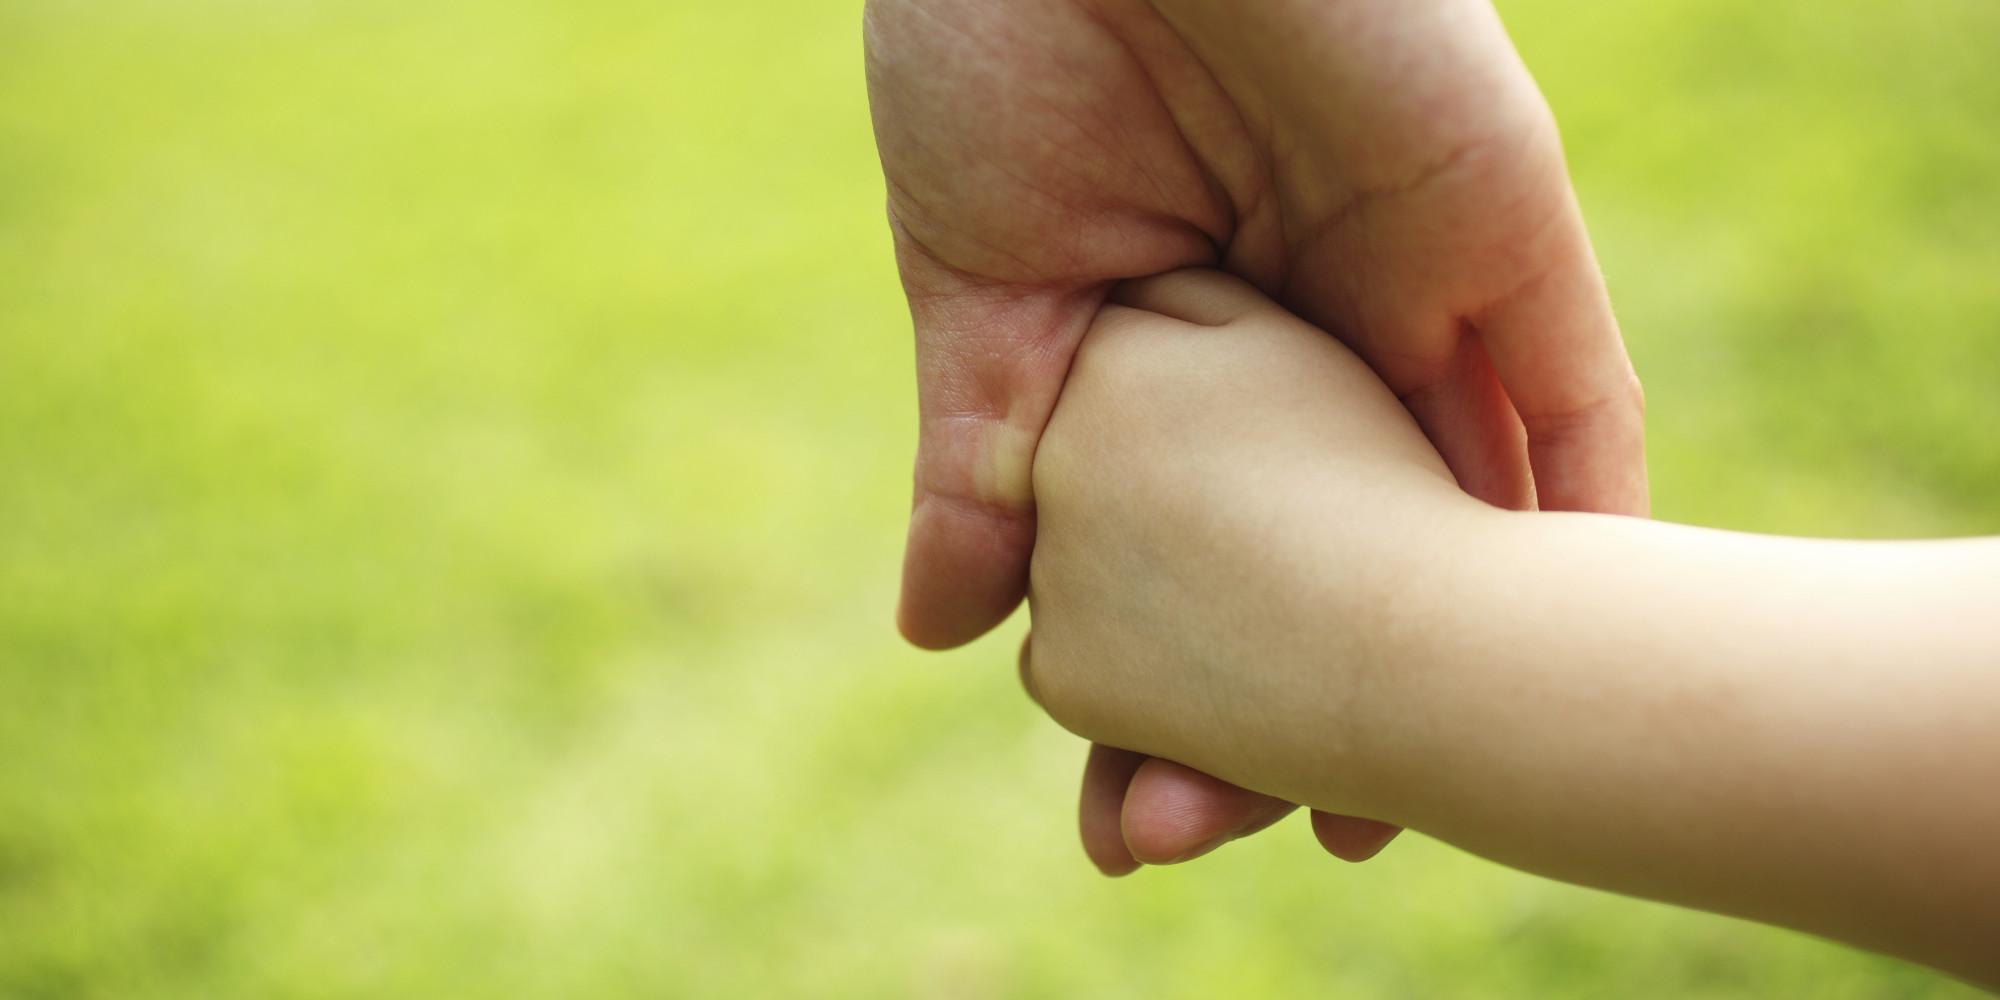 o-adoption-genetics-facebook.jpg